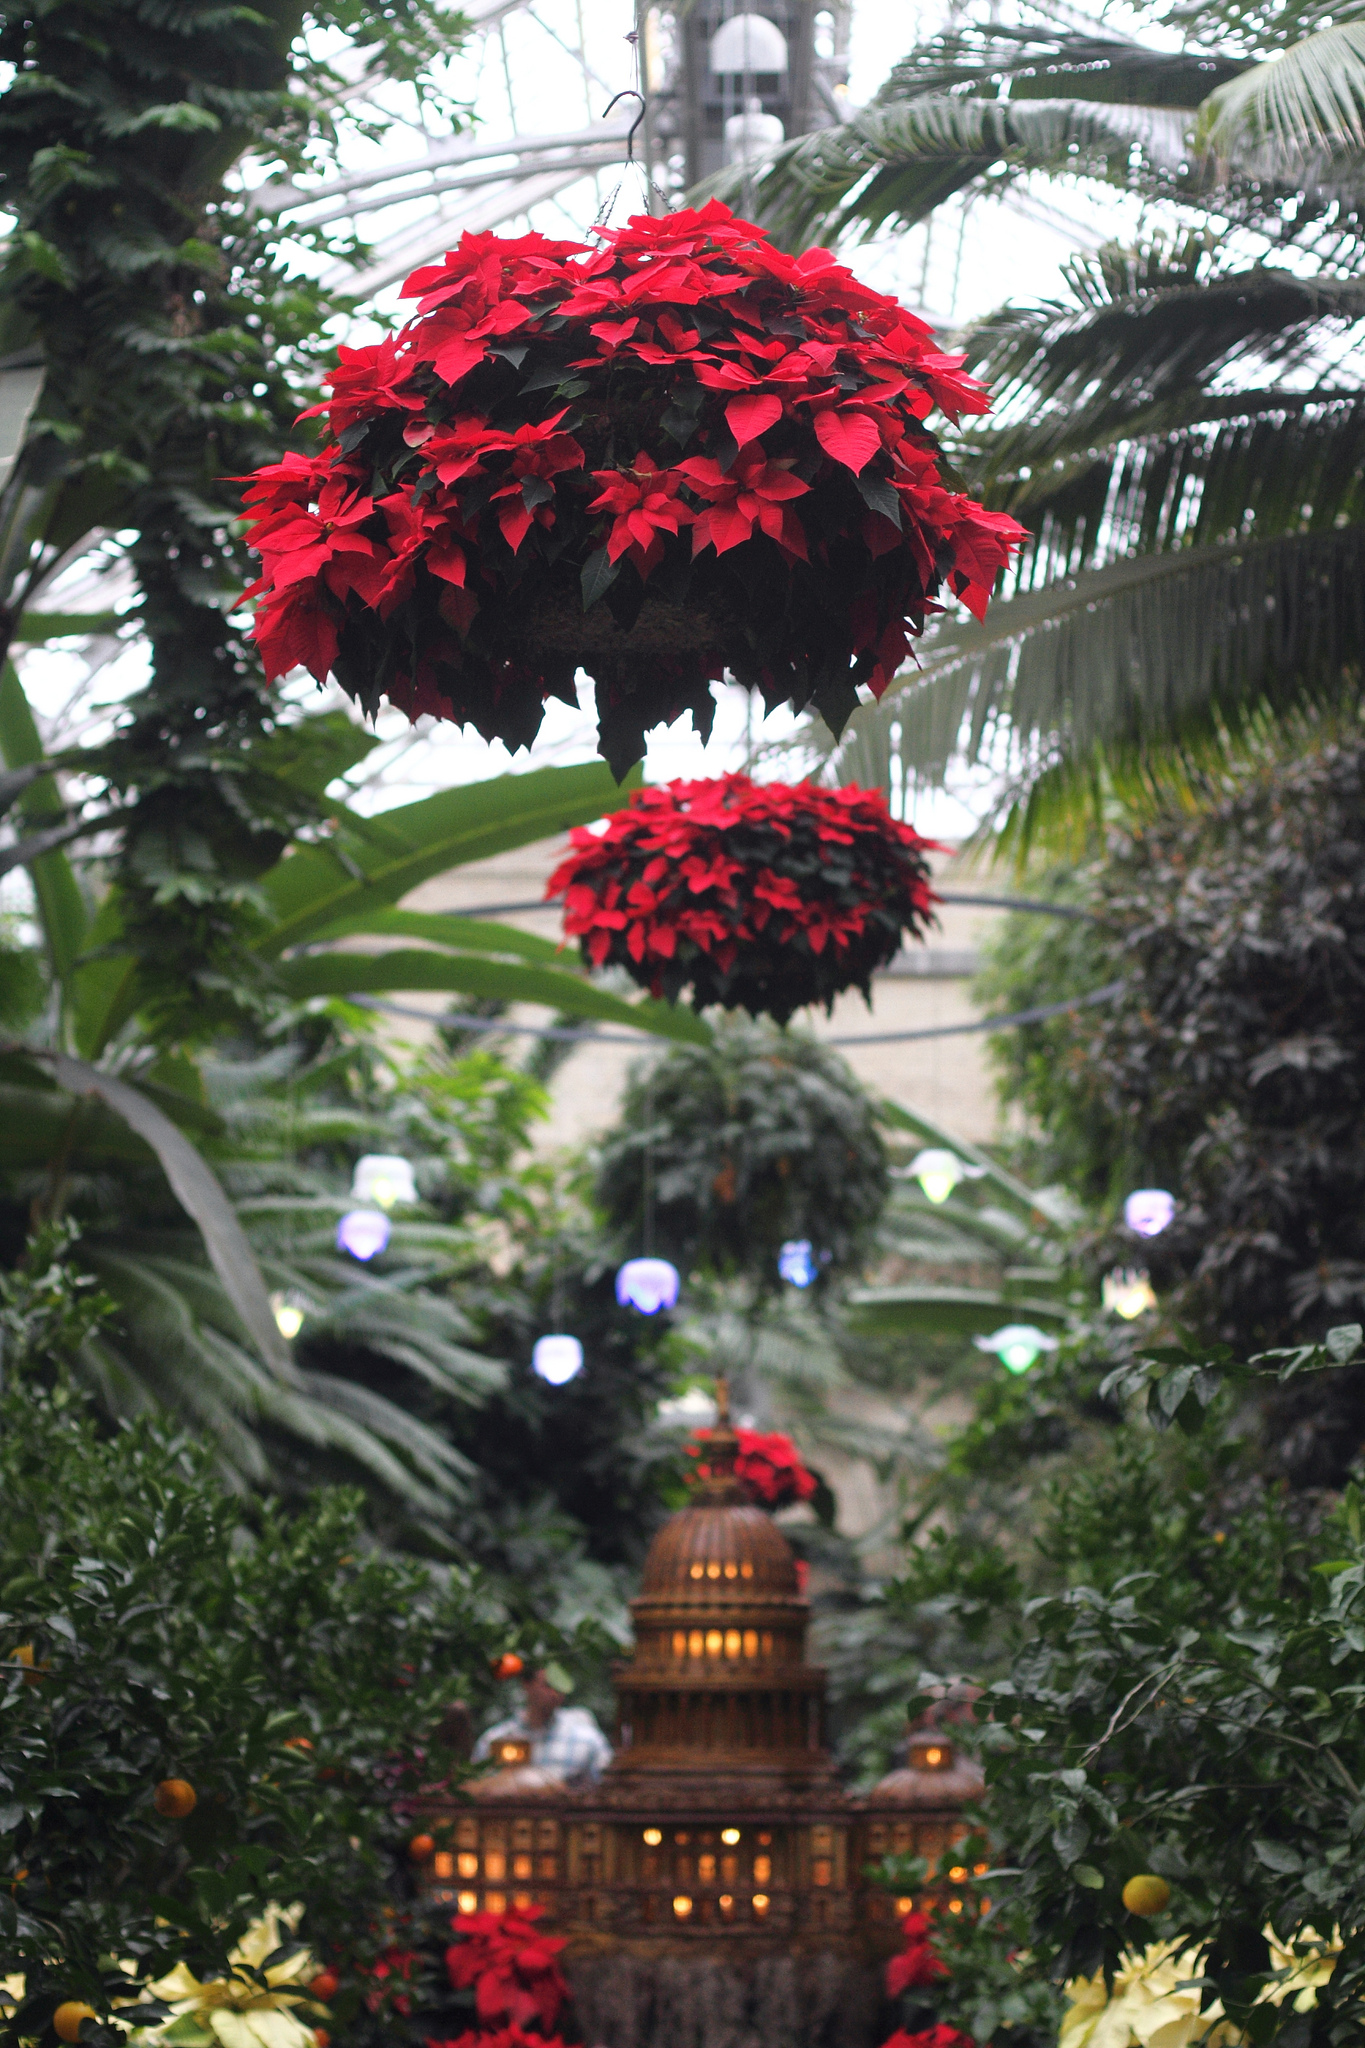 holiday display at U.S. Botanic Garden